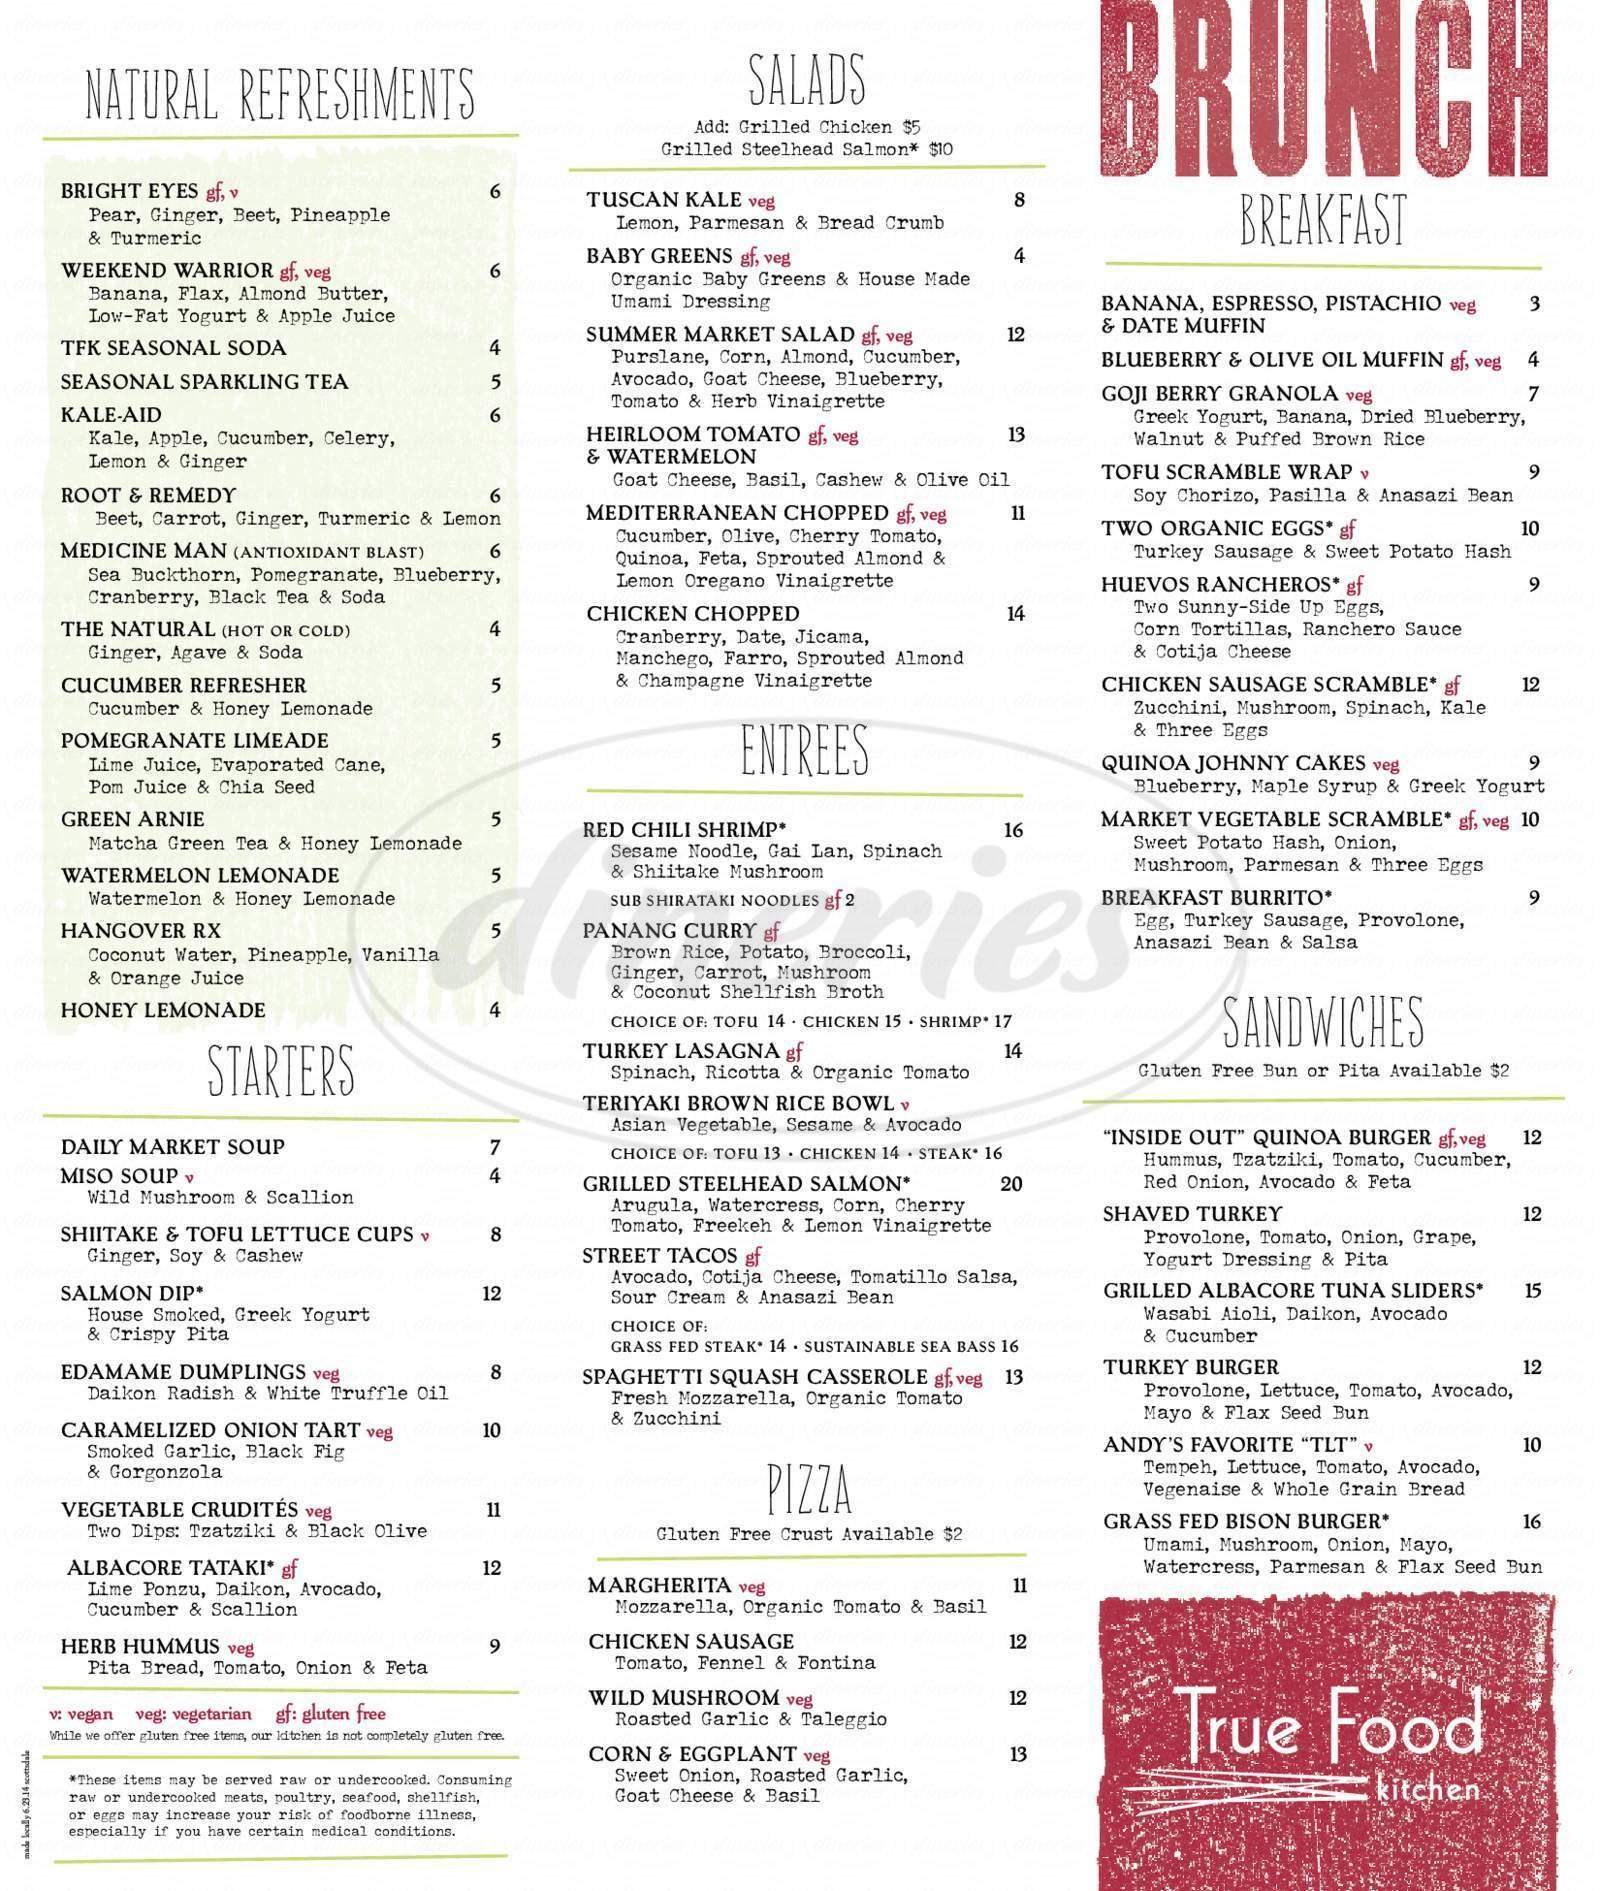 menu for True Food Kitchen